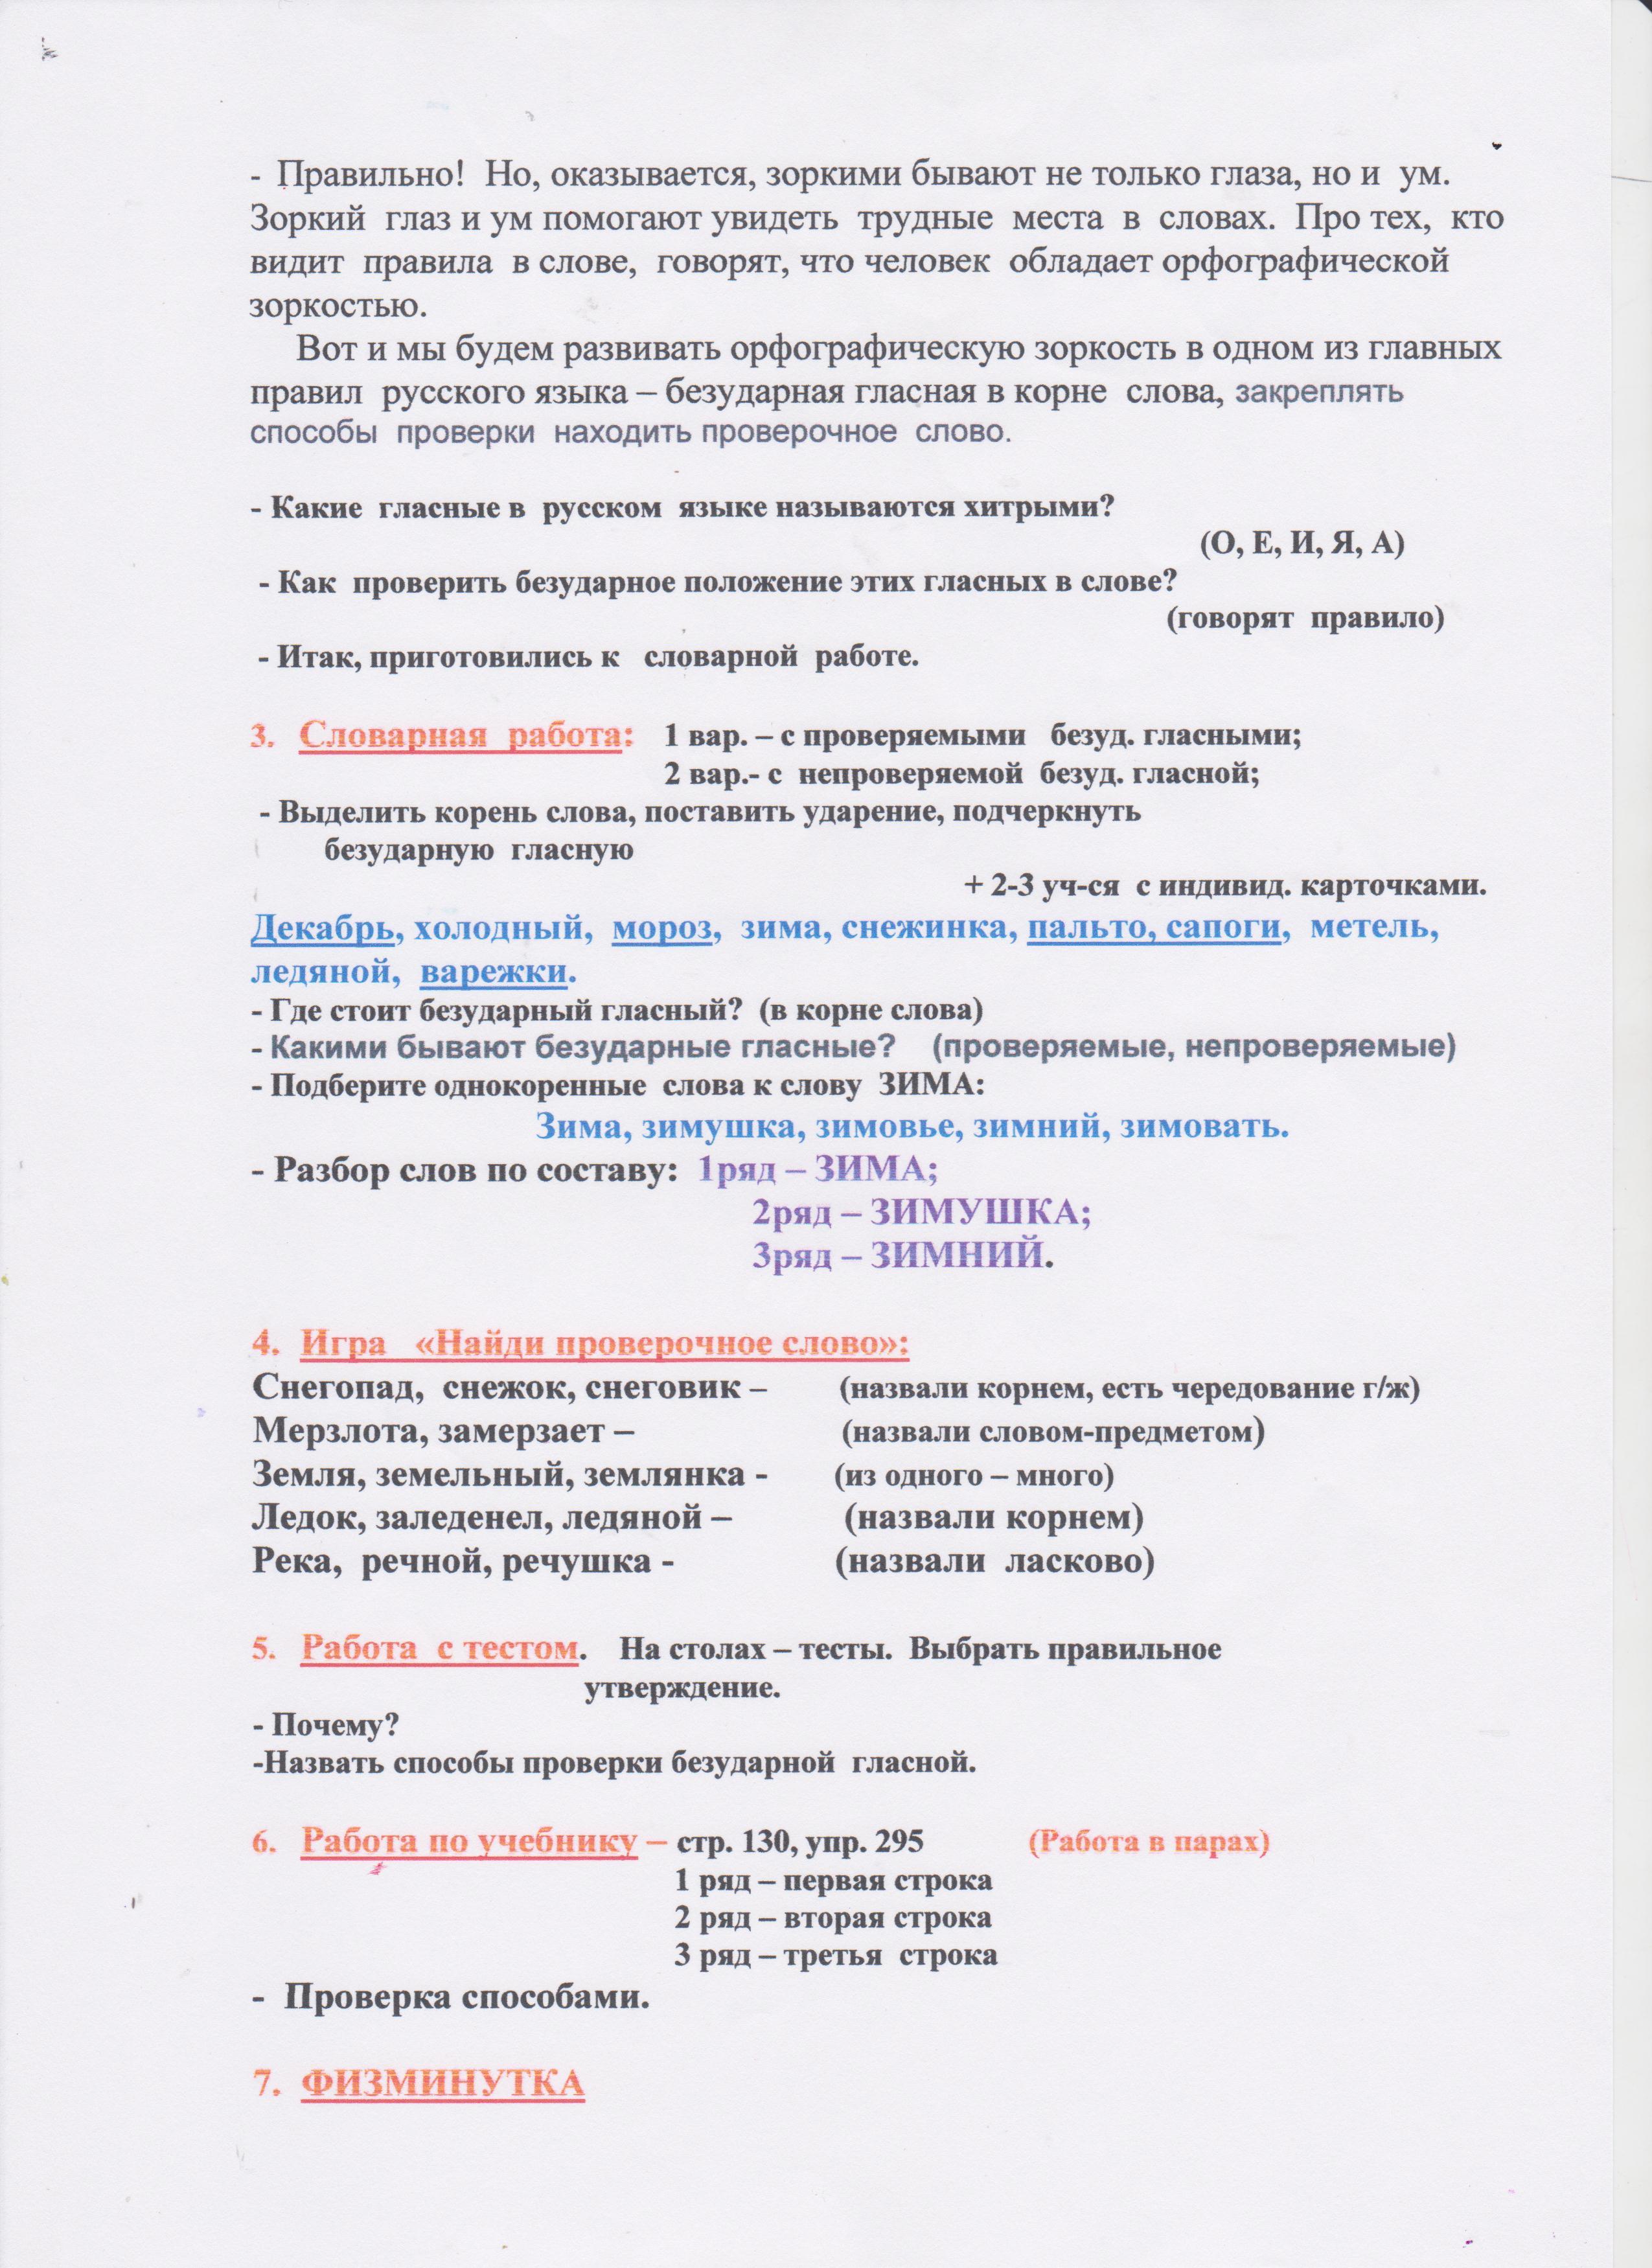 C:\Users\эльвина\Desktop\2014-12-18 2\2 001.jpg